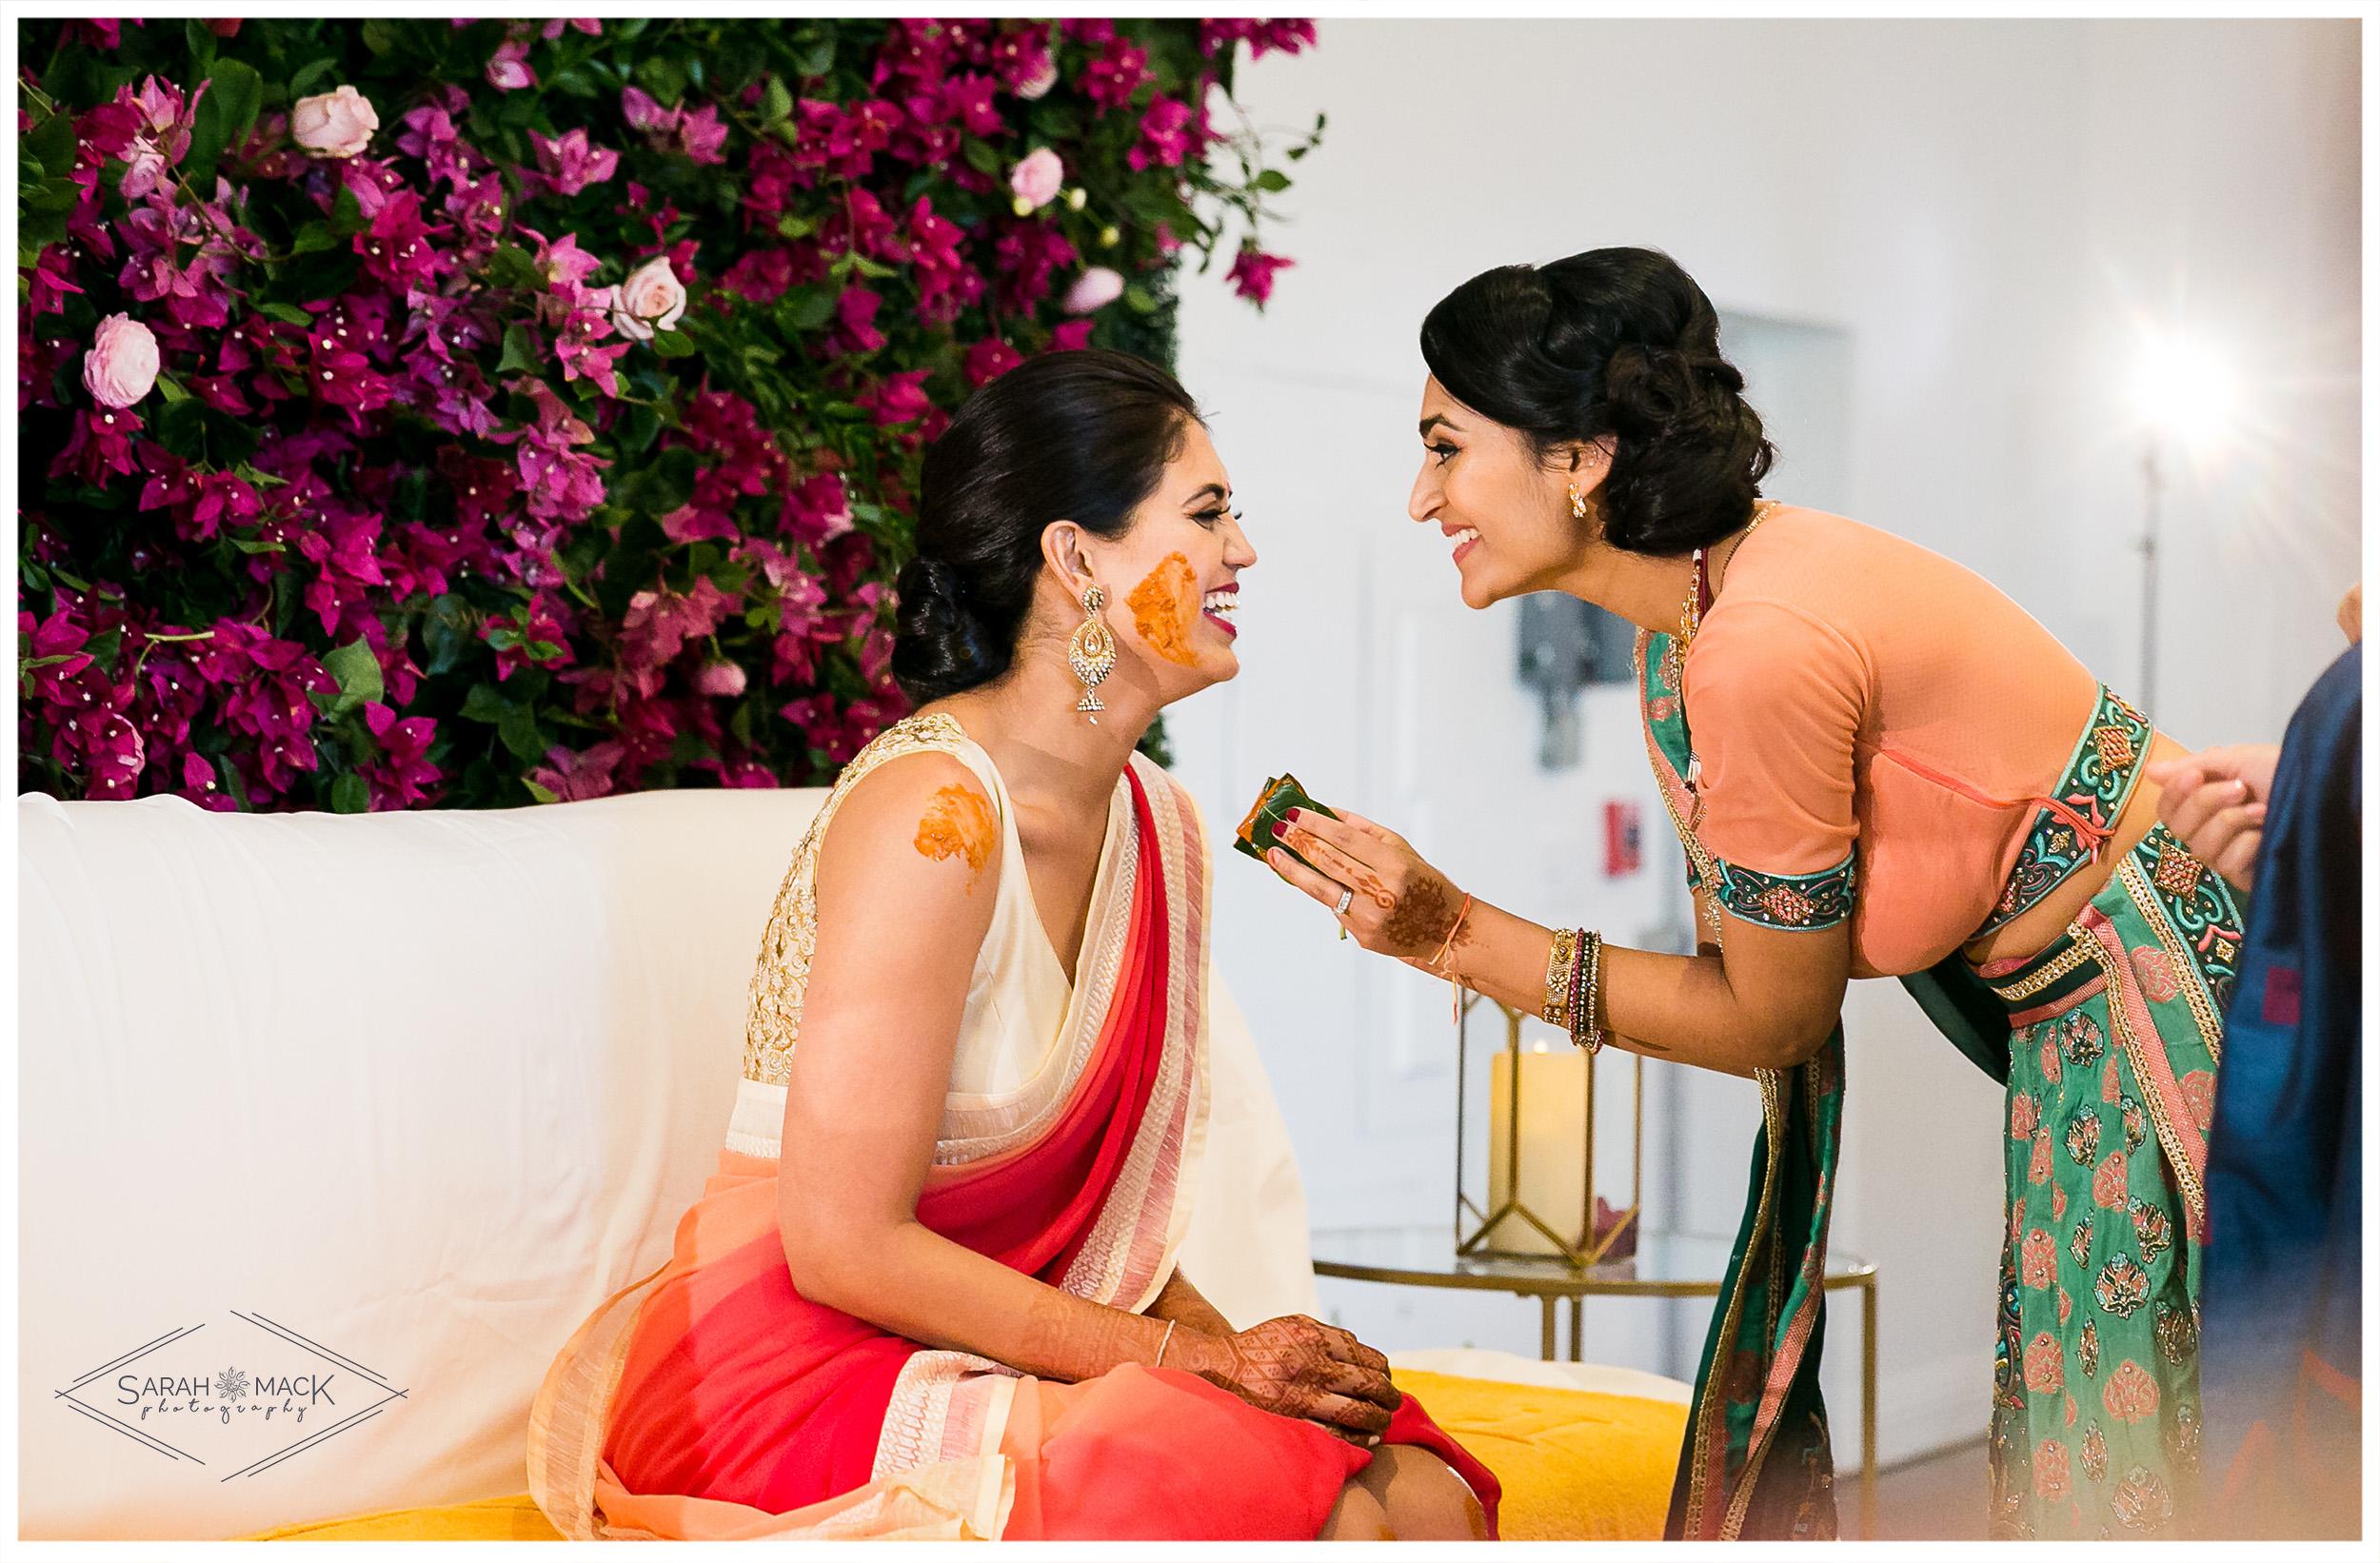 PR-Irvine-Ganesh-Pooja-Indian-Wedding-Photography-21.jpg